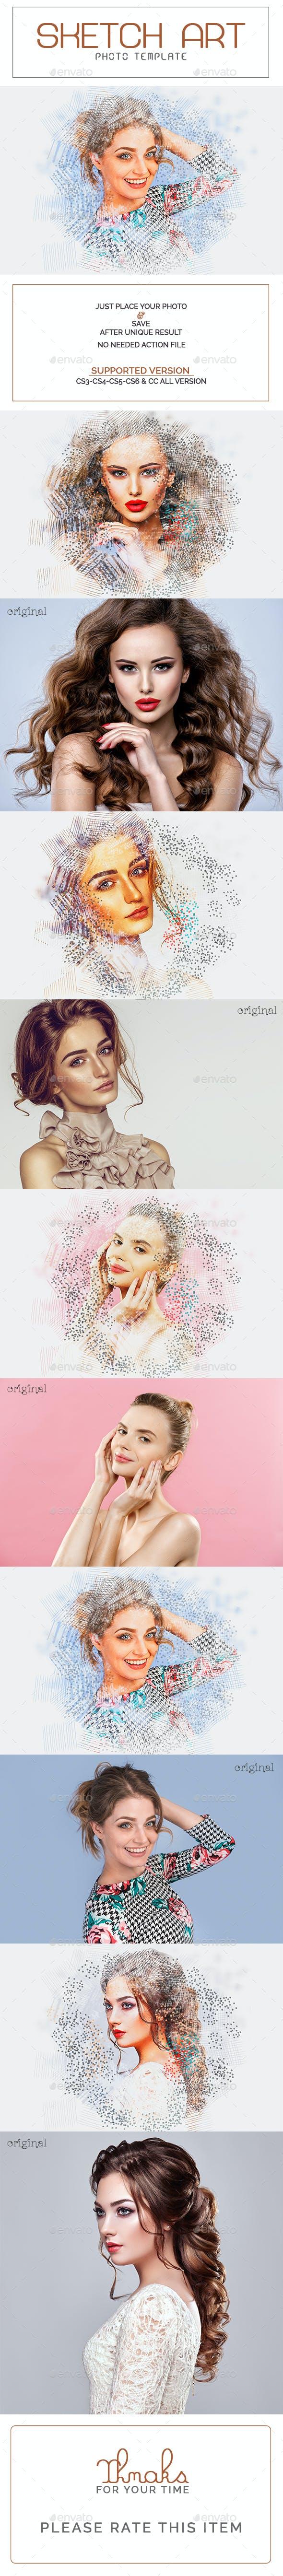 Sketch Art Photo Template - Photo Templates Graphics